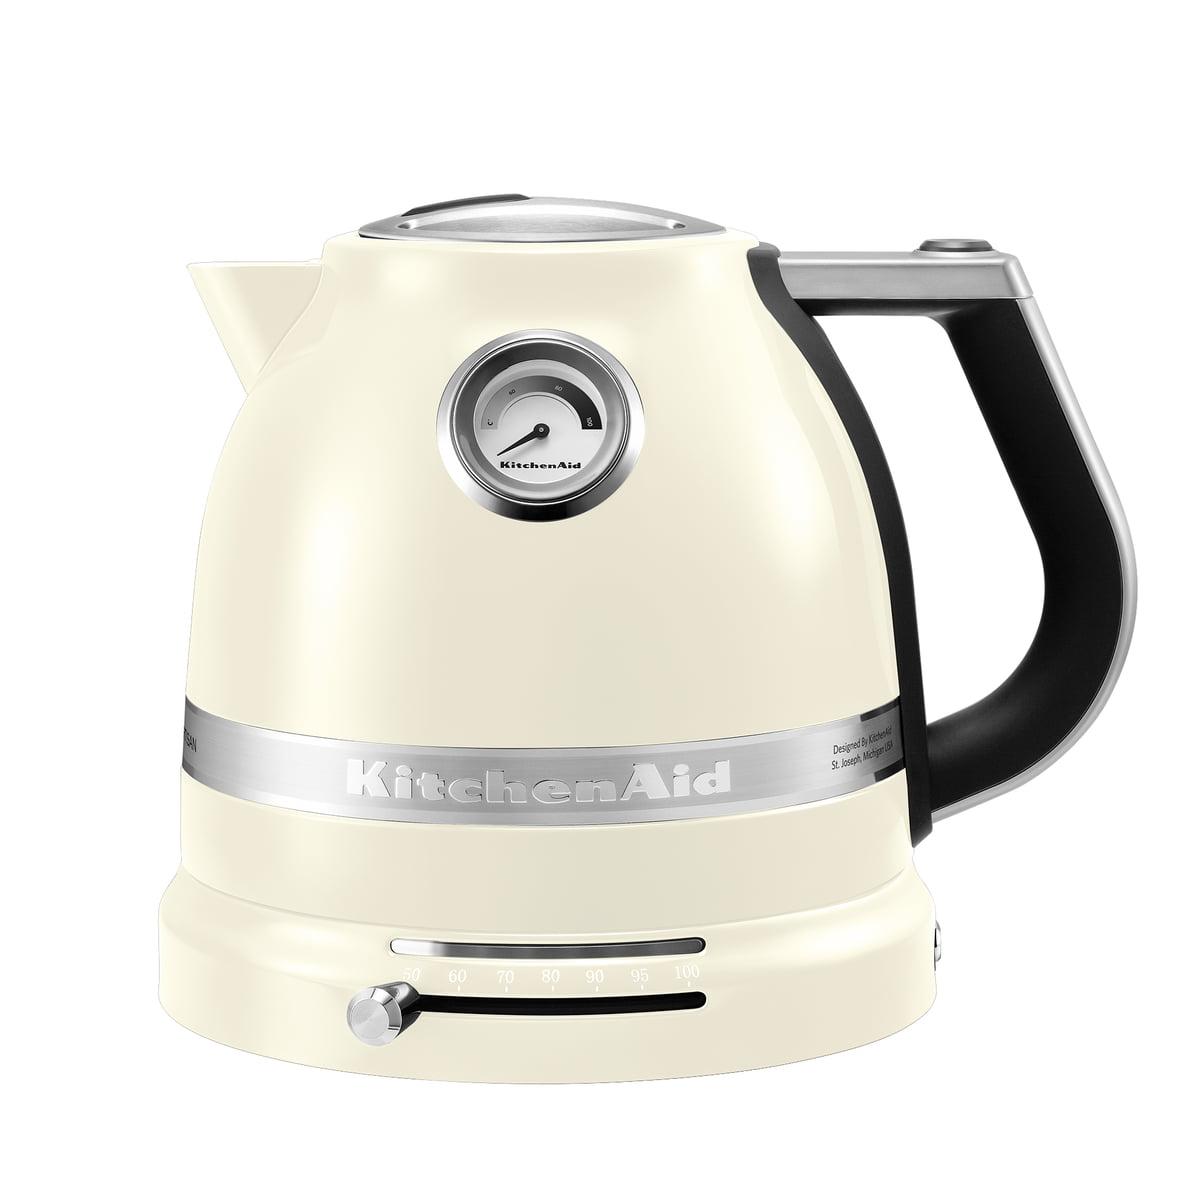 Kitchenaid Kettle 1 5 L Cream